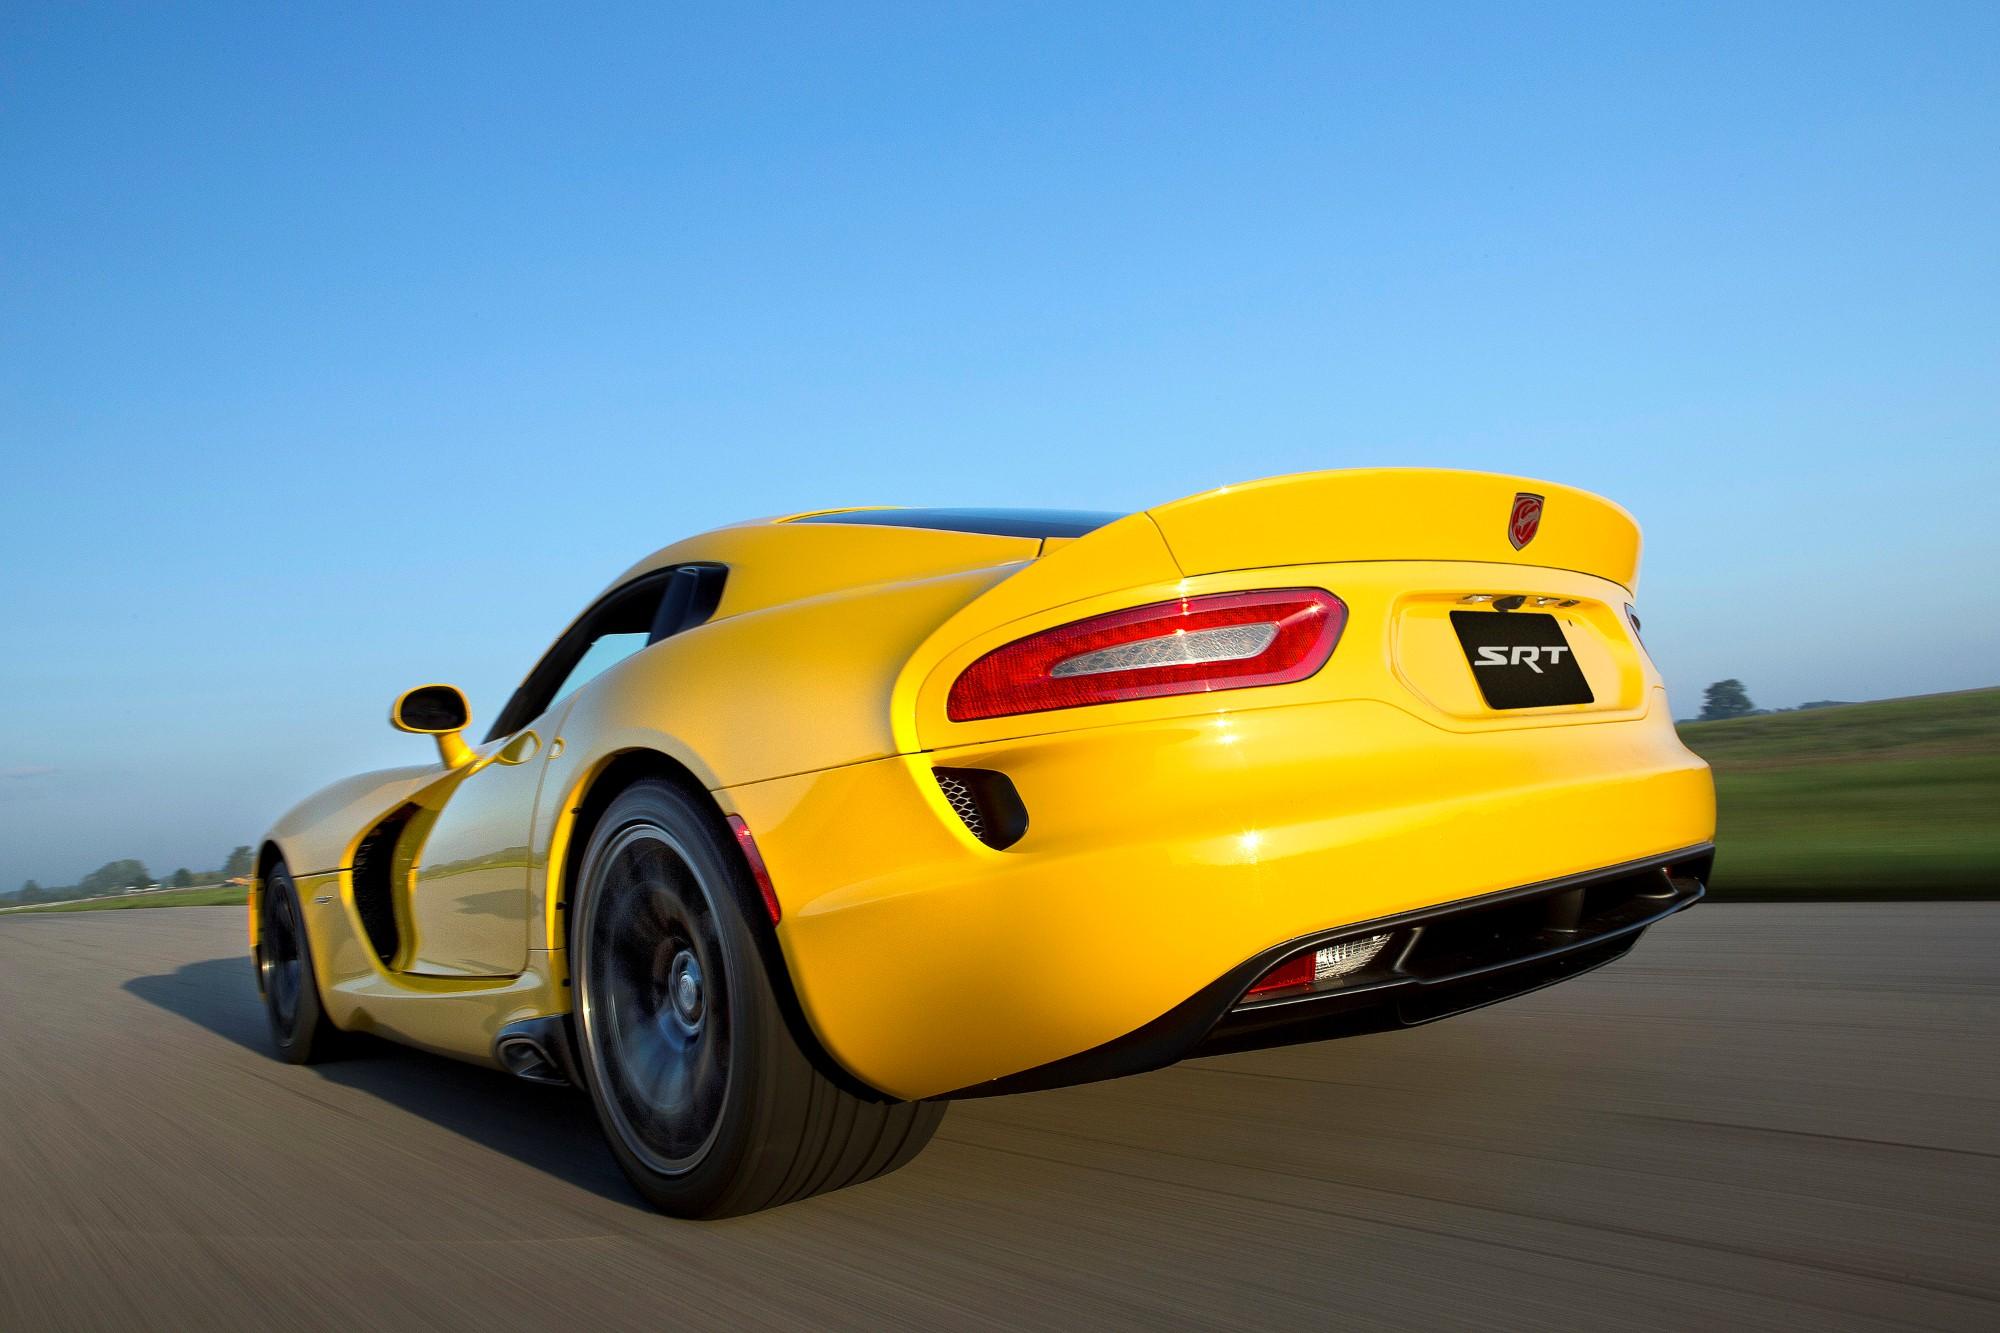 Viper Priced Aventador Crashed 2014 Nissan Gt R Spied